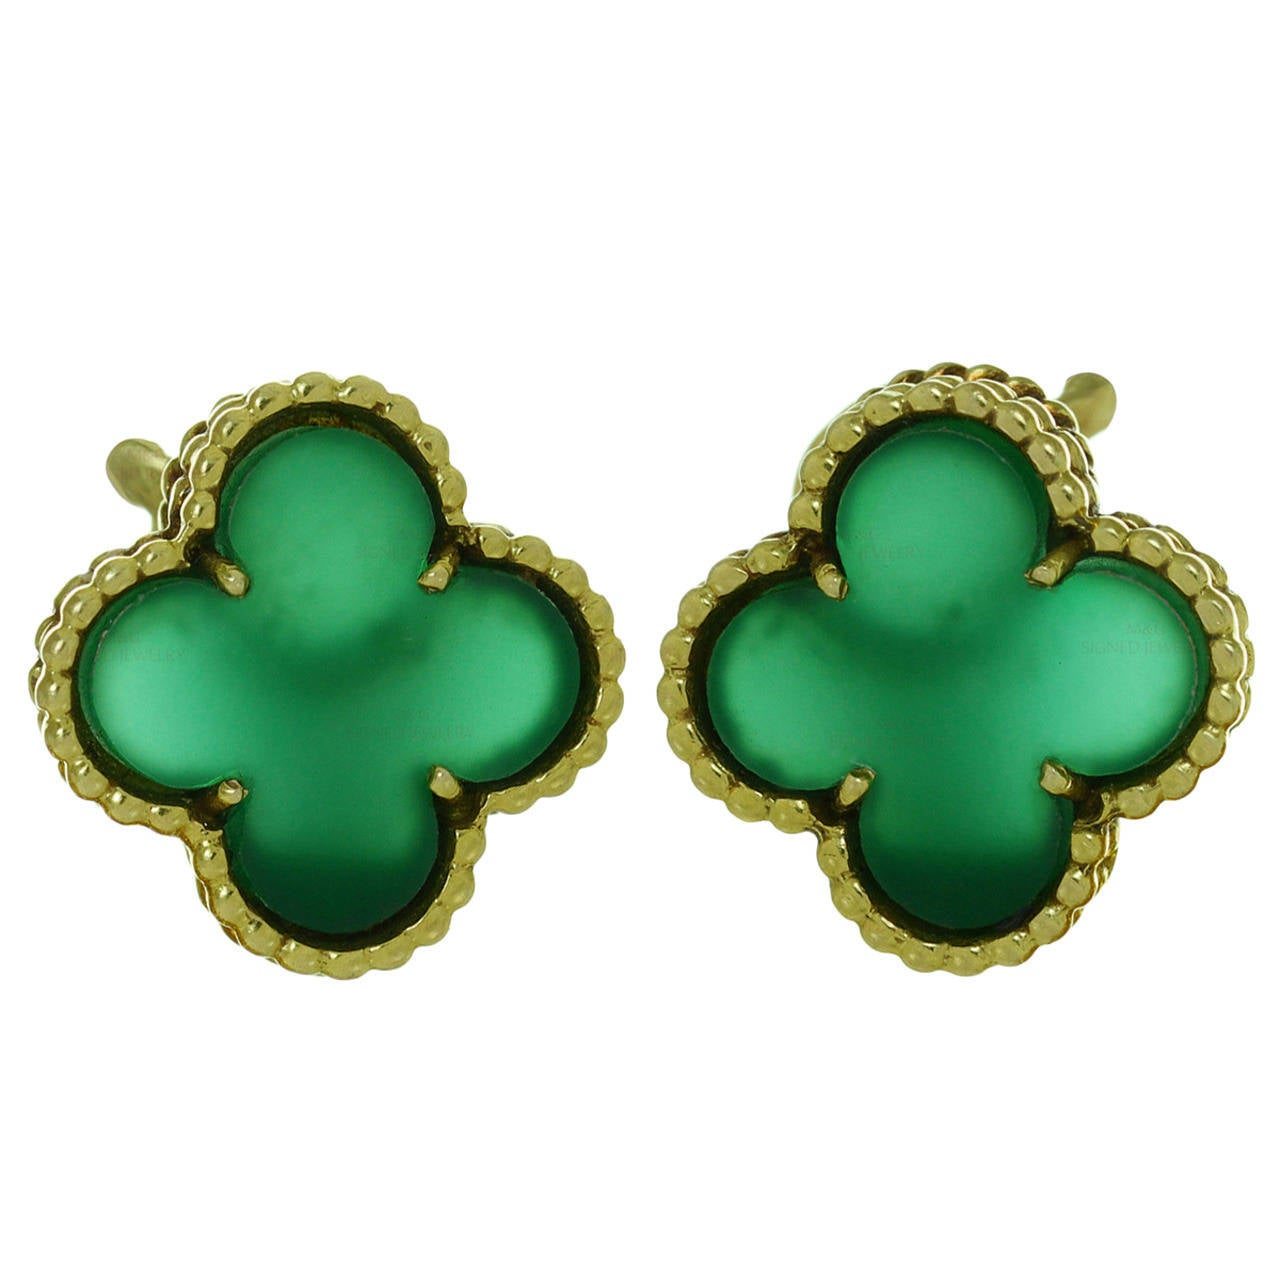 1970s Van Cleef & Arpels Alhambra Green Chalcedony Gold Earrings 1